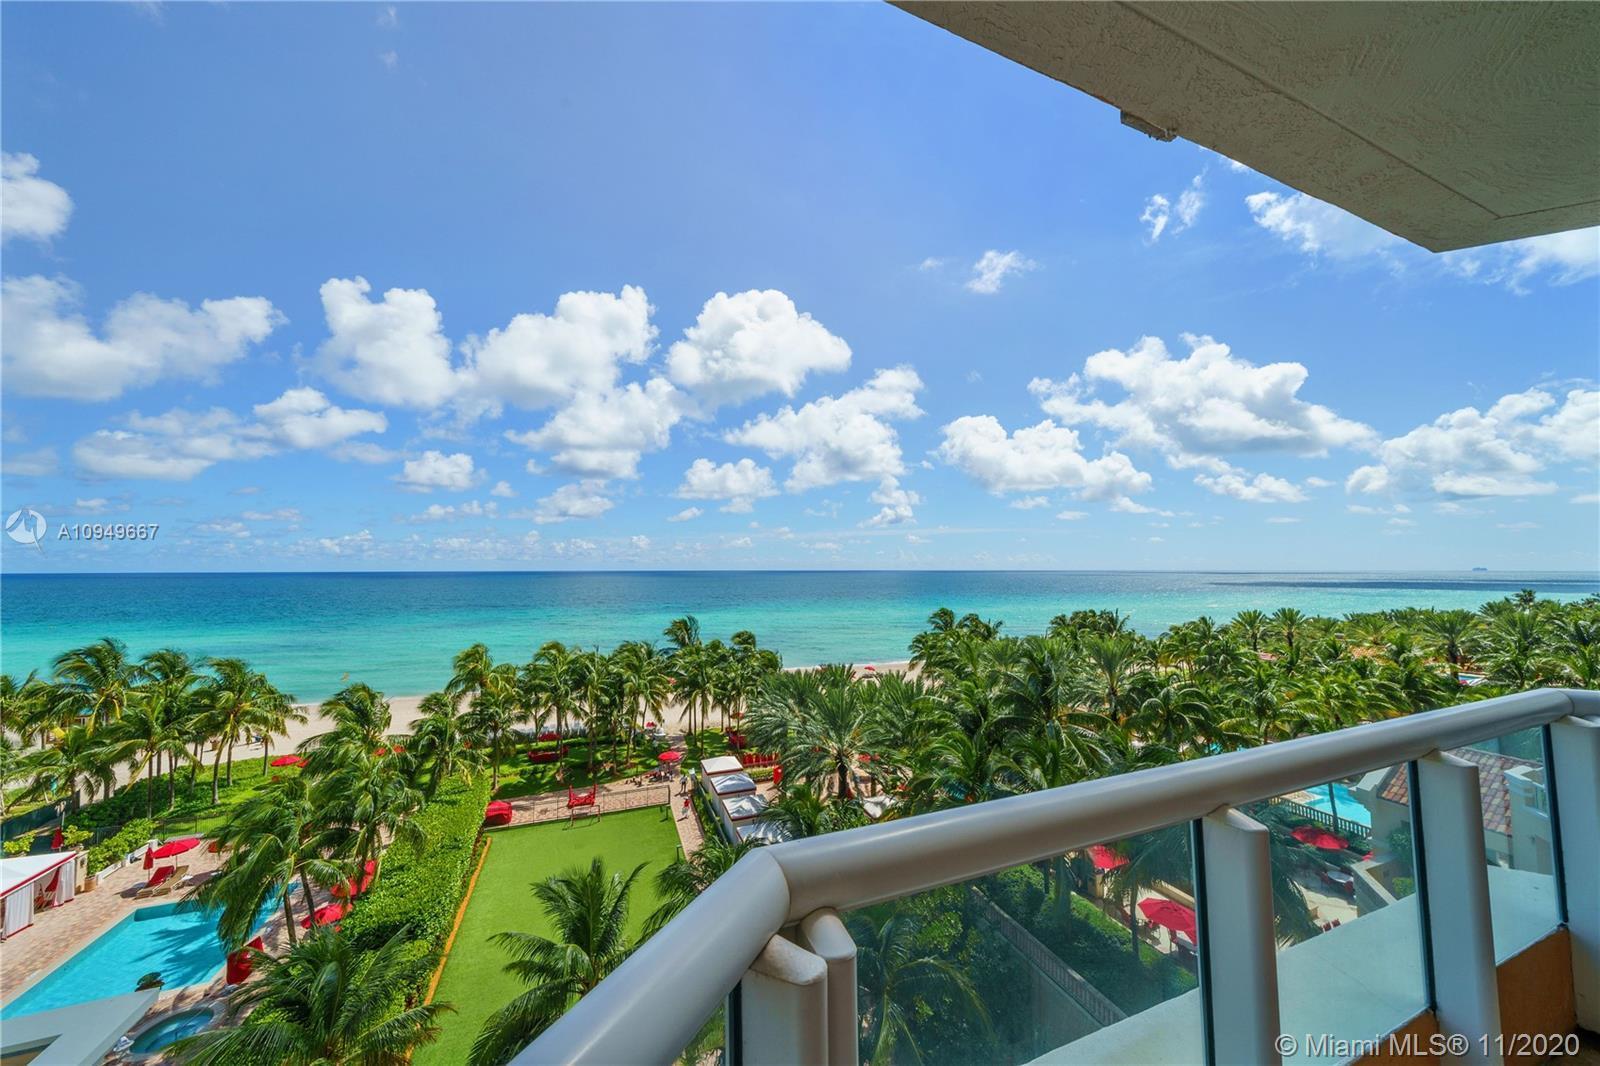 Gorgeous Corner Ocean Front Corner Unit in Acqualina Ocean Residences & Resort. This magnificent 3B/